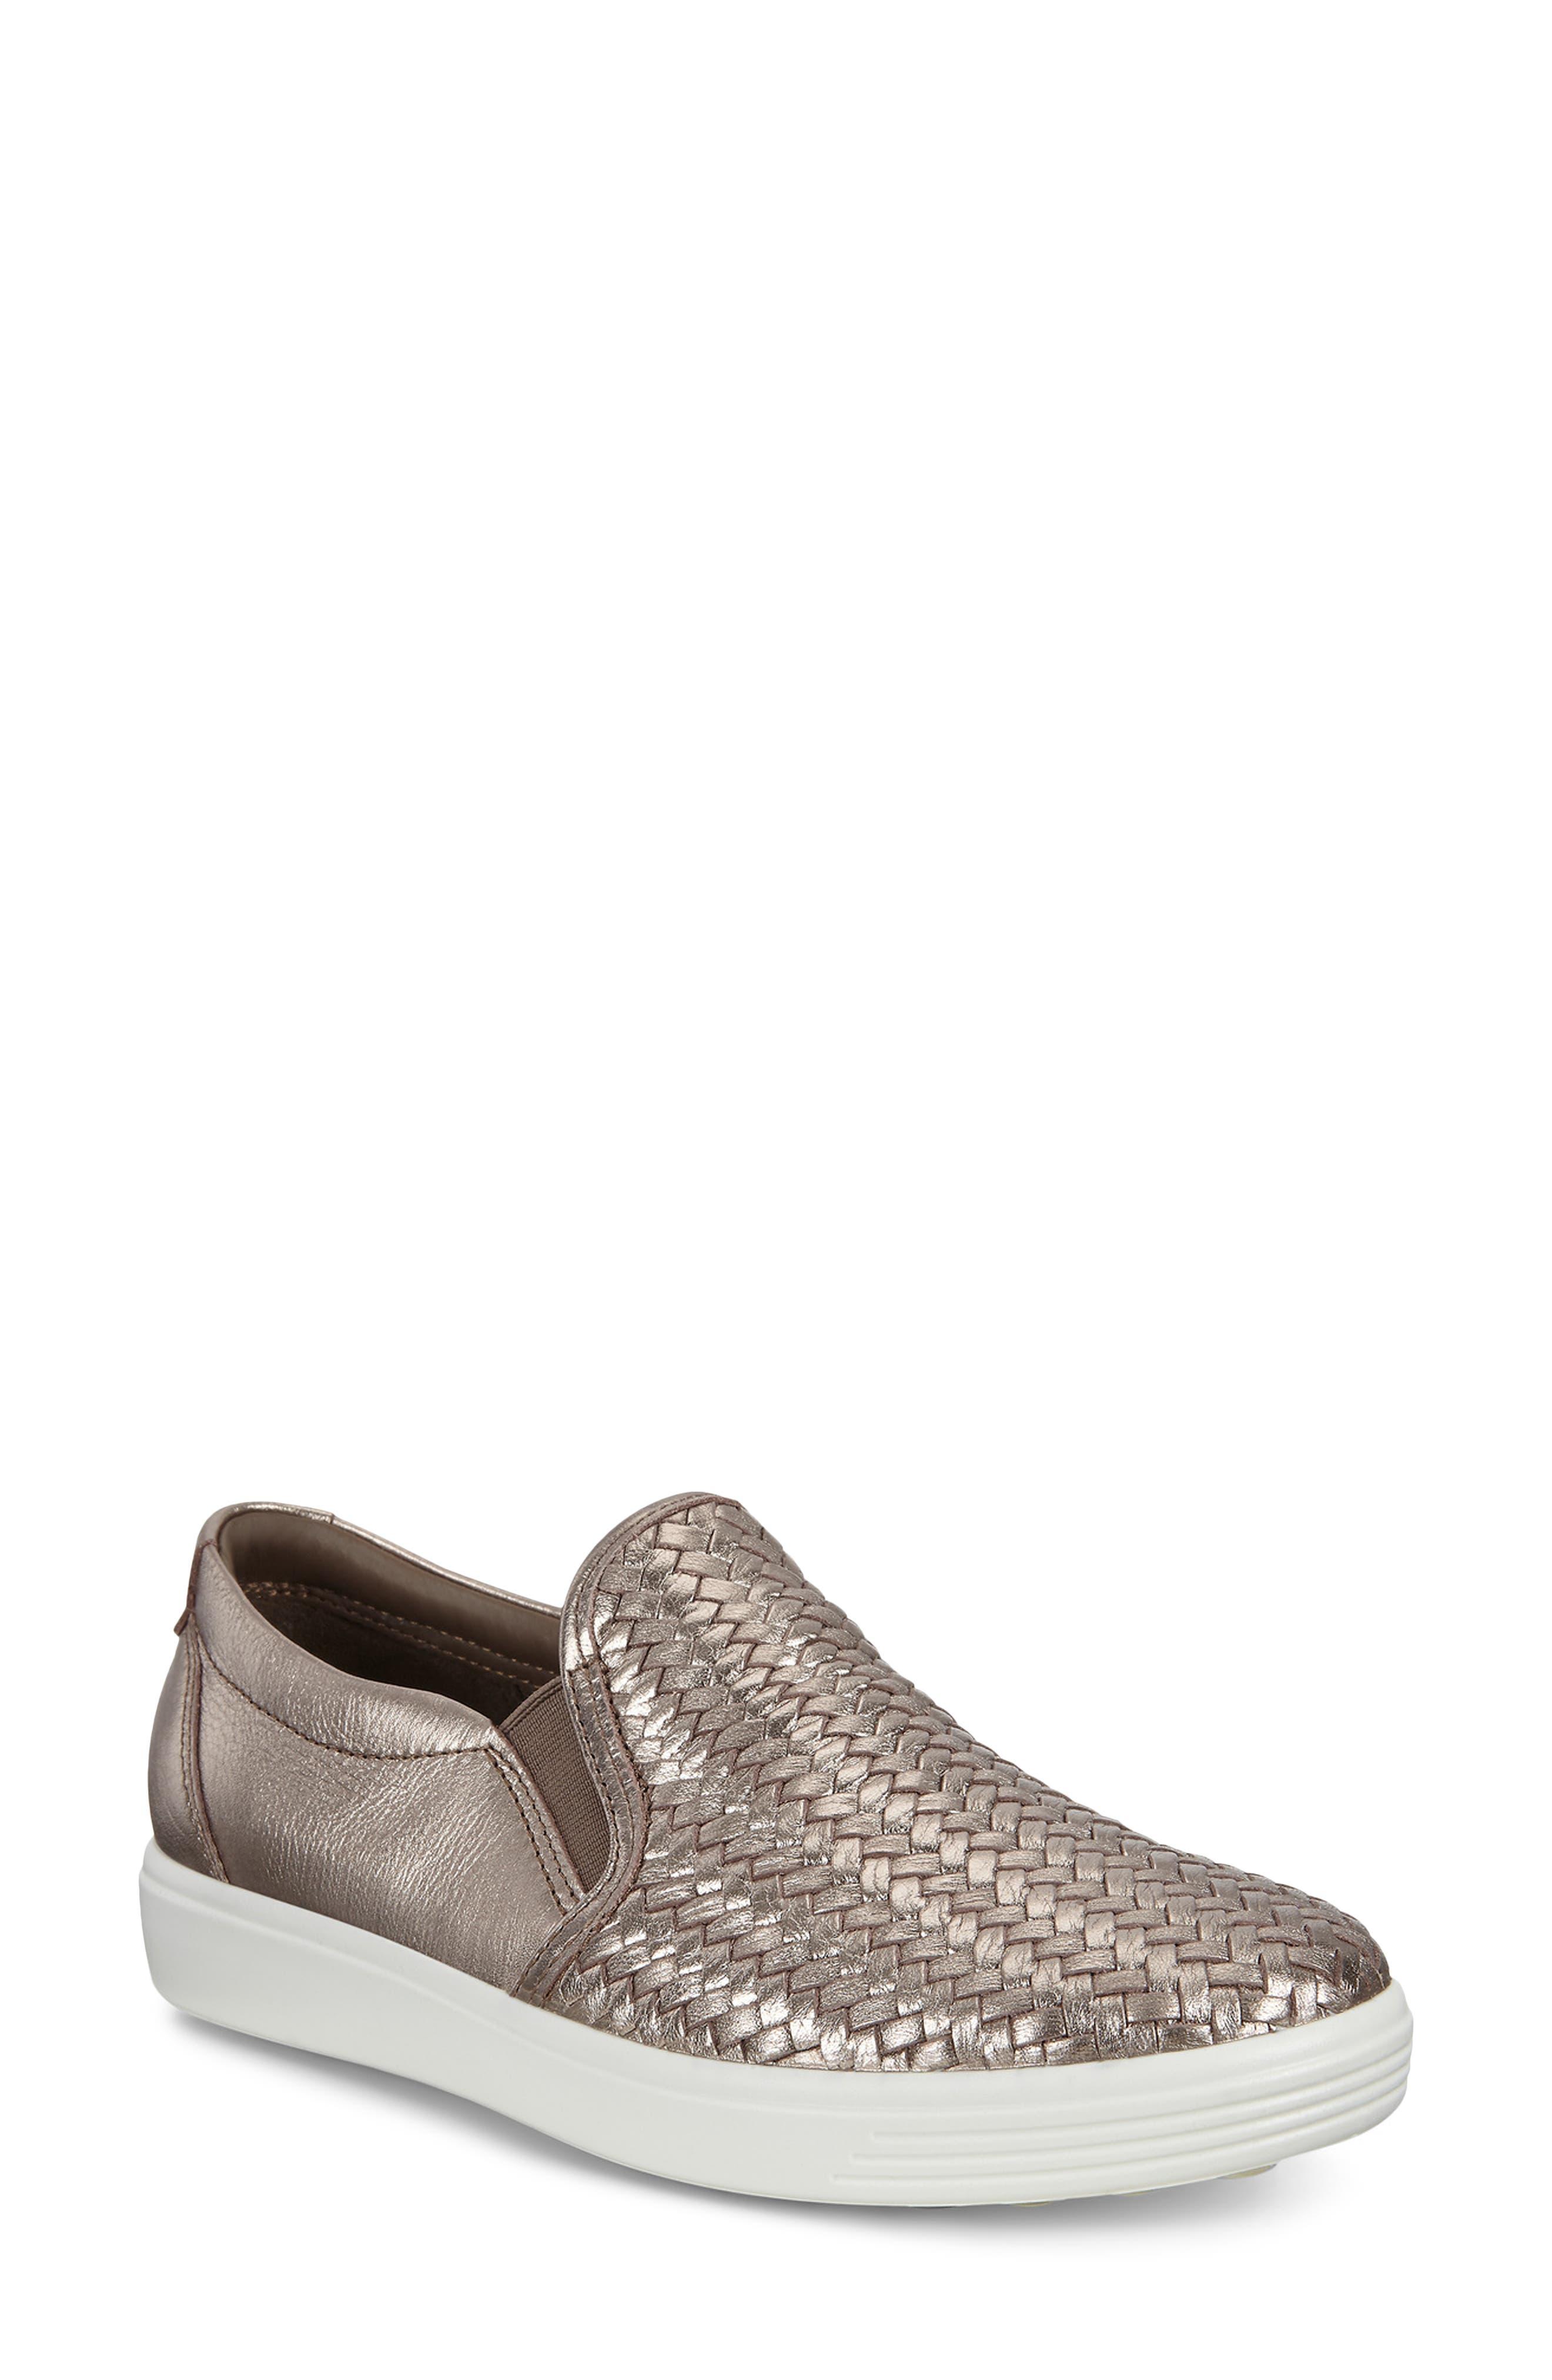 Women's Ecco Soft 7 Slip-On Sneaker